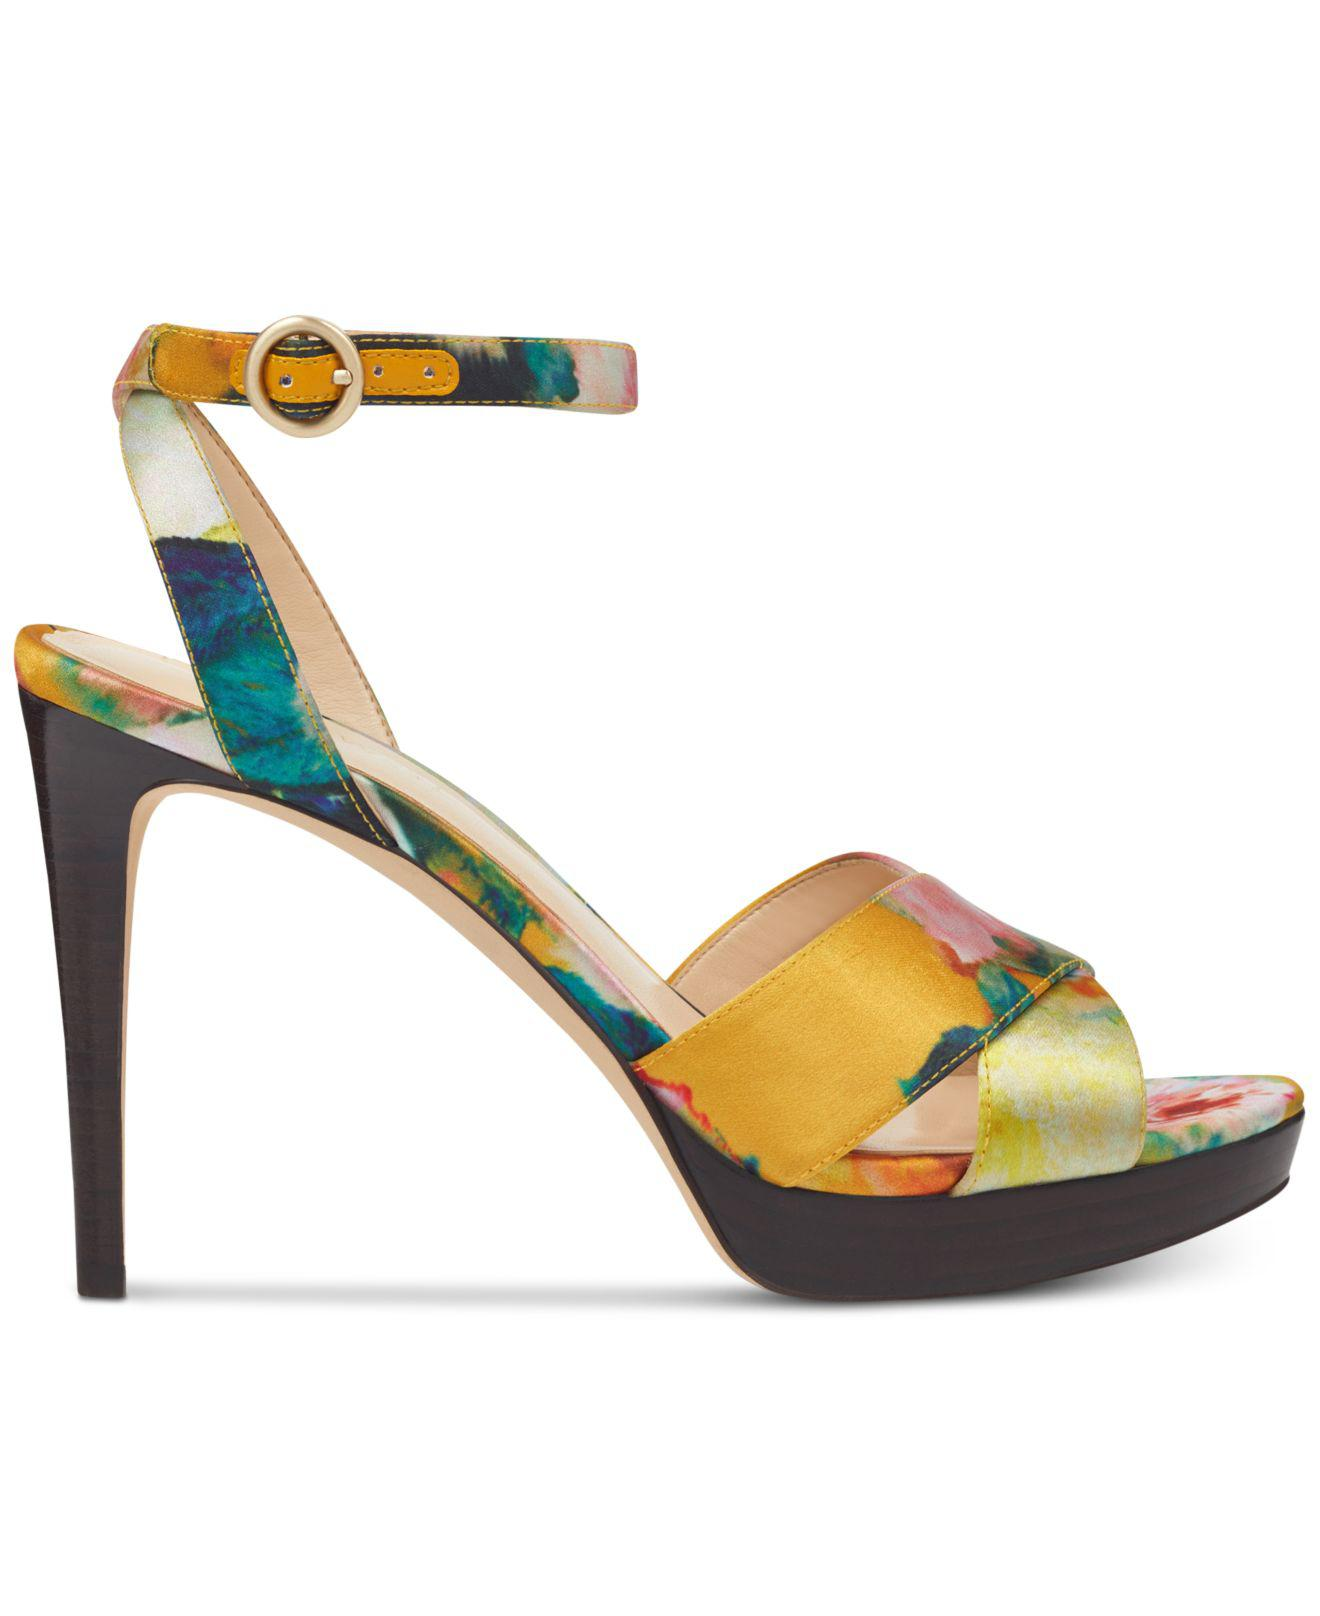 46b020fe7072 Lyst - Nine West Quisha Platform Sandals in Yellow